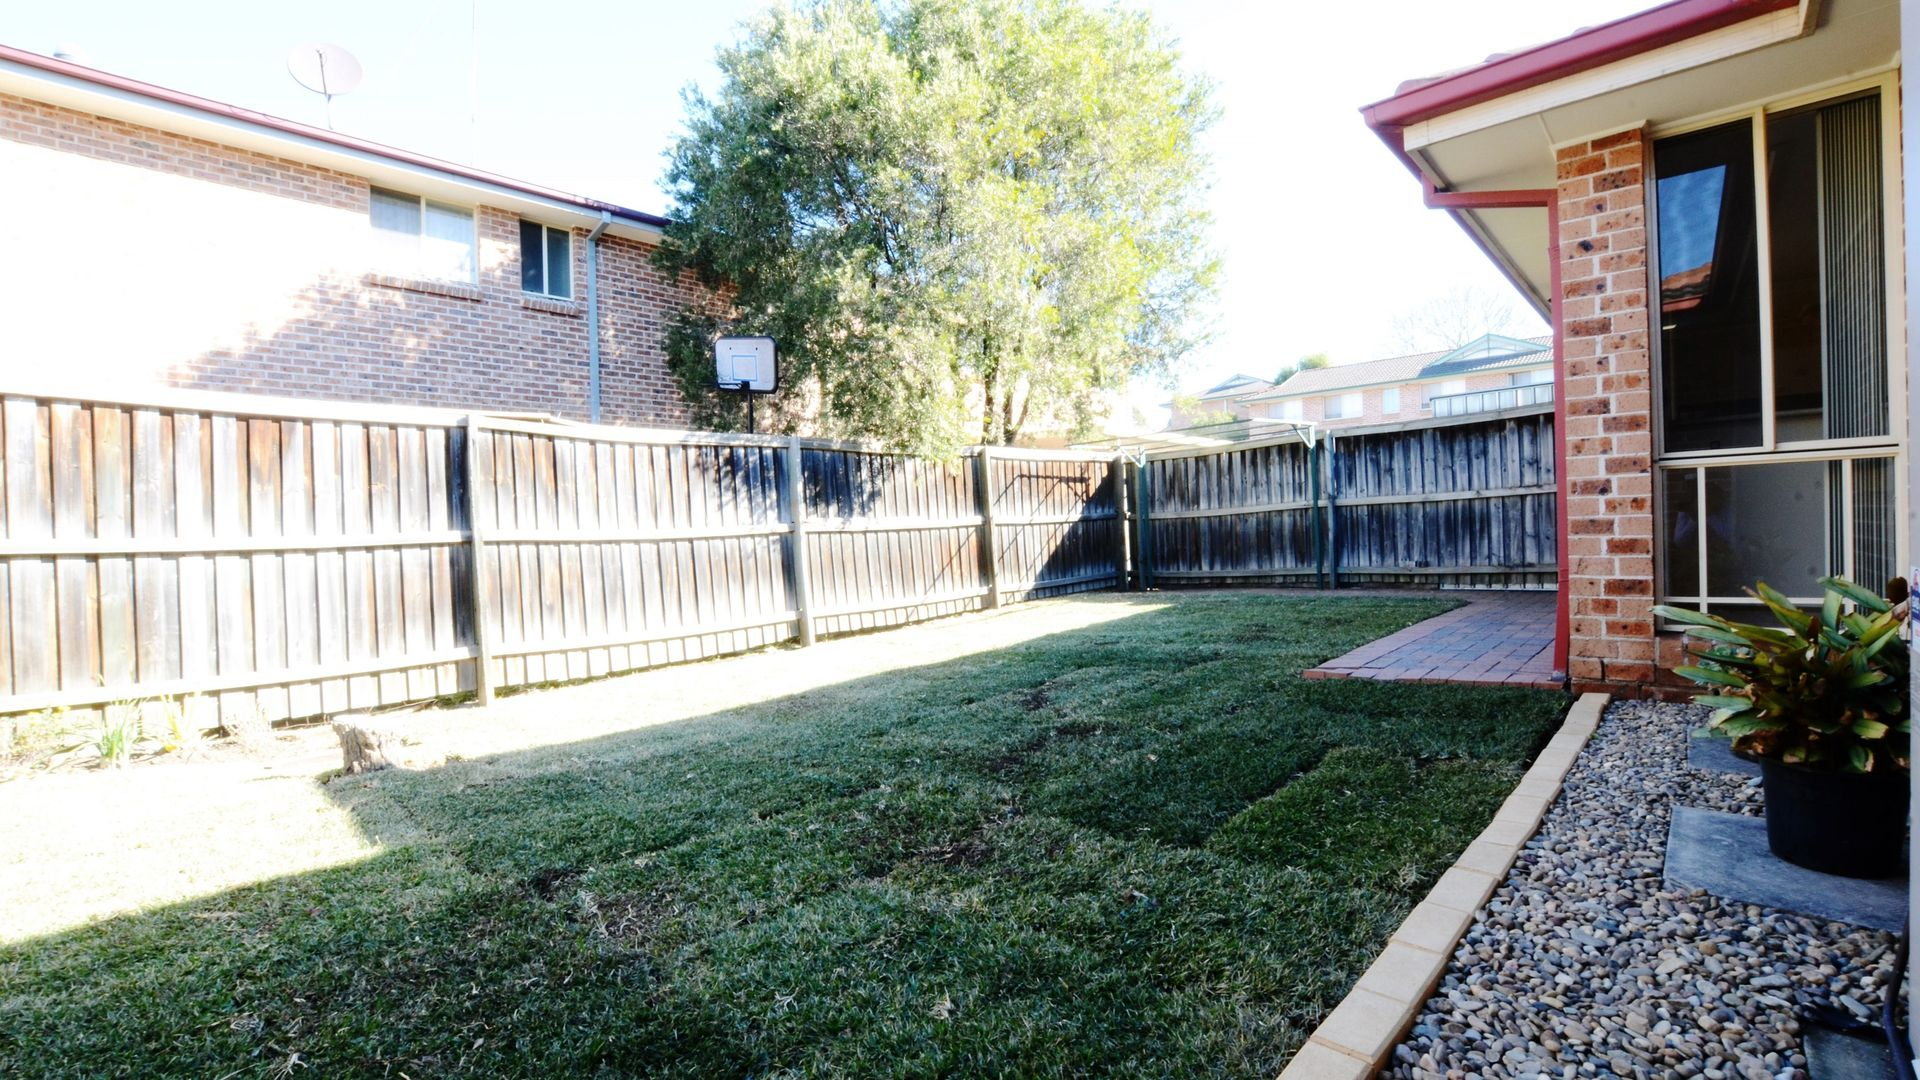 18/41 St Martins Cres, Blacktown NSW 2148, Image 2